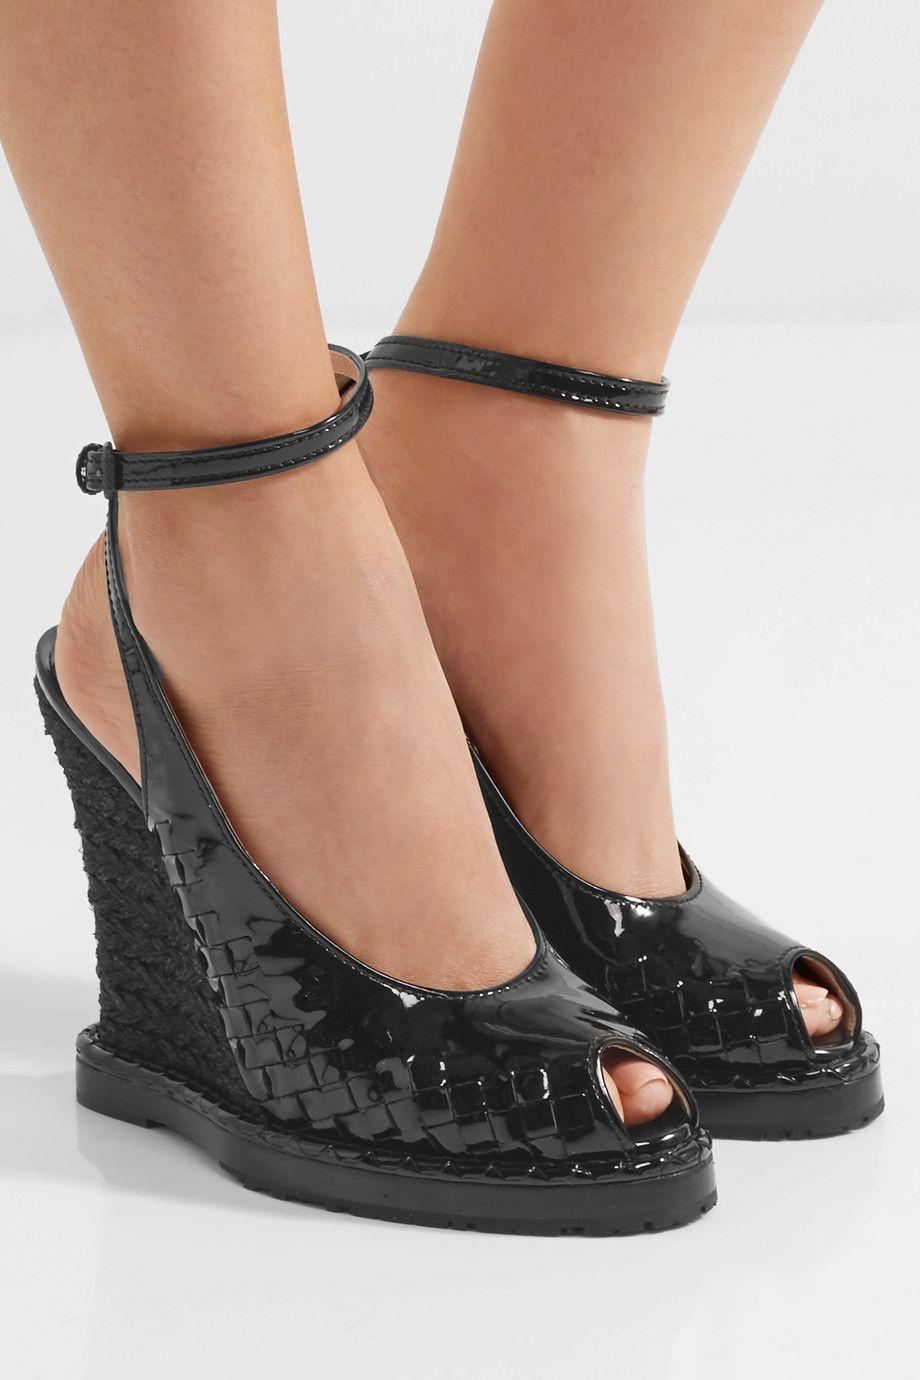 Bottega Veneta   Intrecciato patent-leather espadrille wedge sandals   NET-A-PORTER.COM